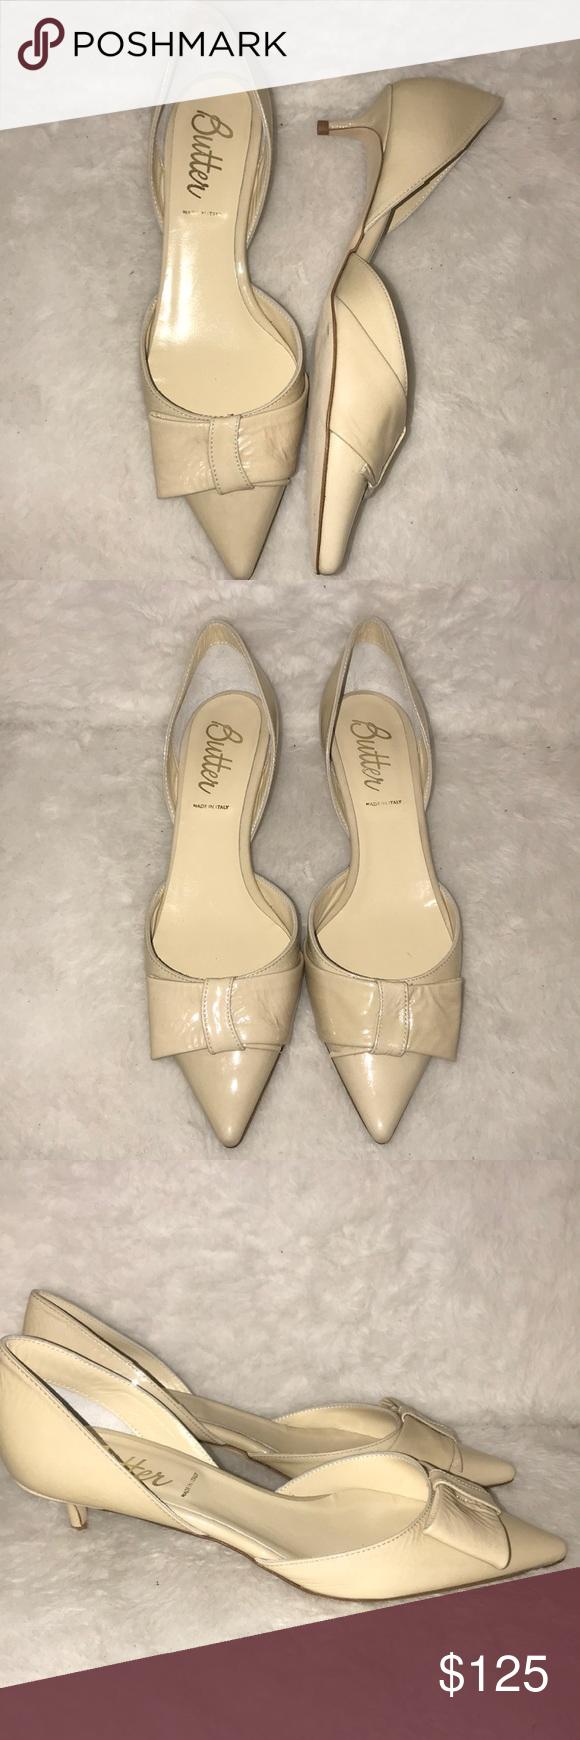 Cream Patent Leather Pointed Toe Kitten Heels Kitten Heels Heels Butter Shoes